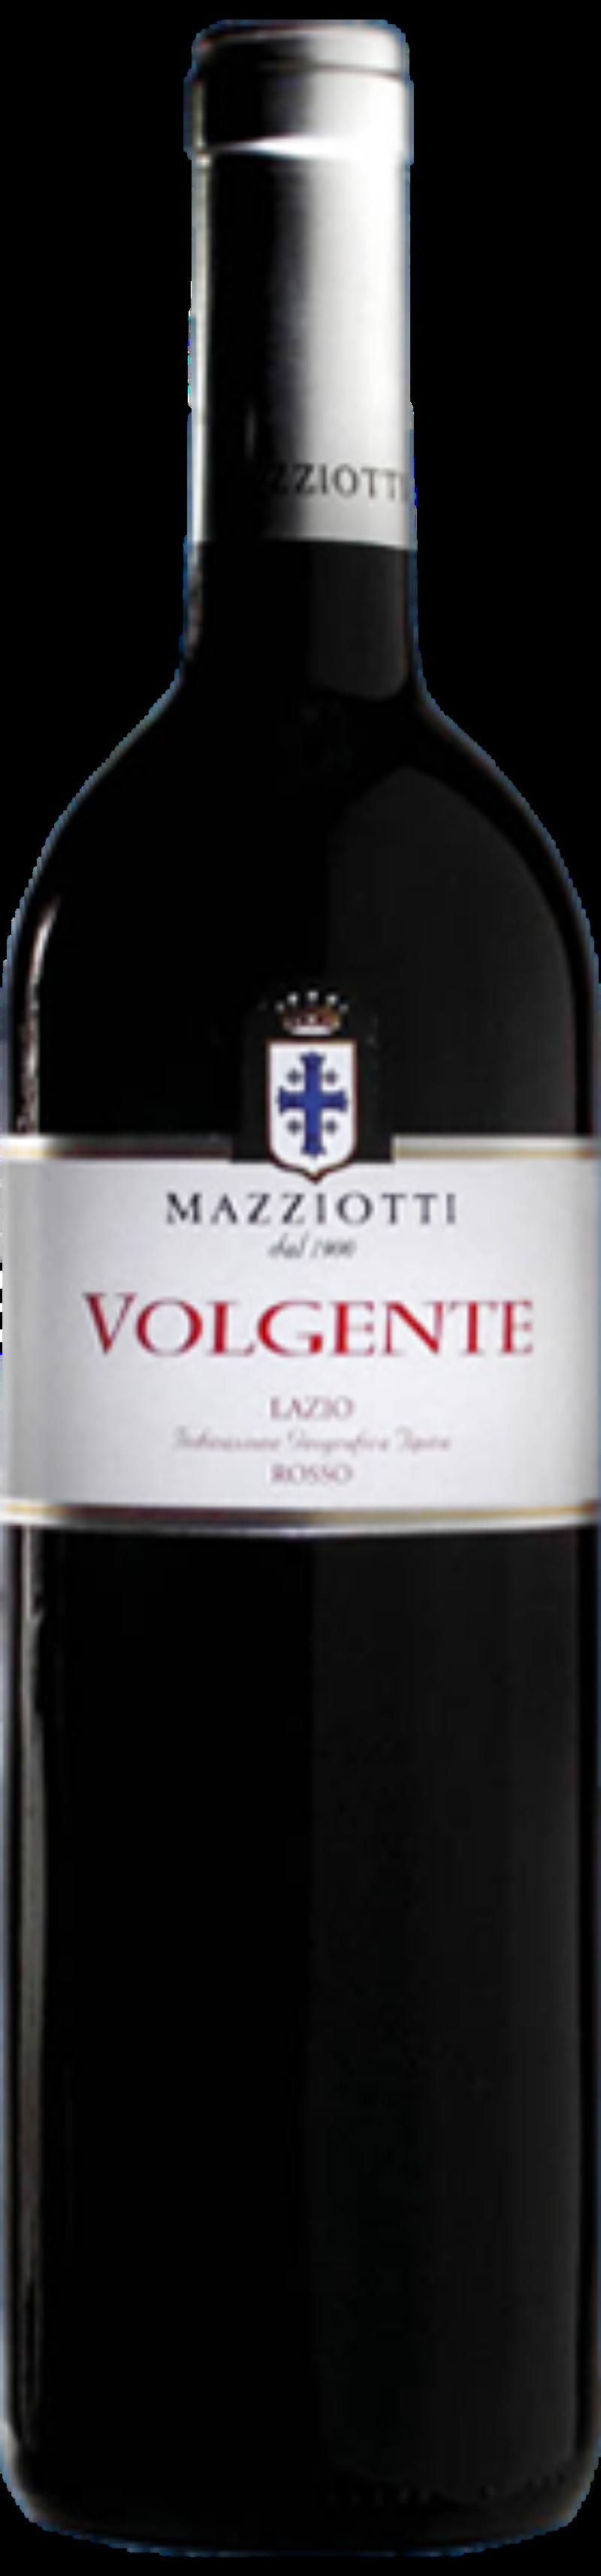 VOLGENTE----IGP--Lazio